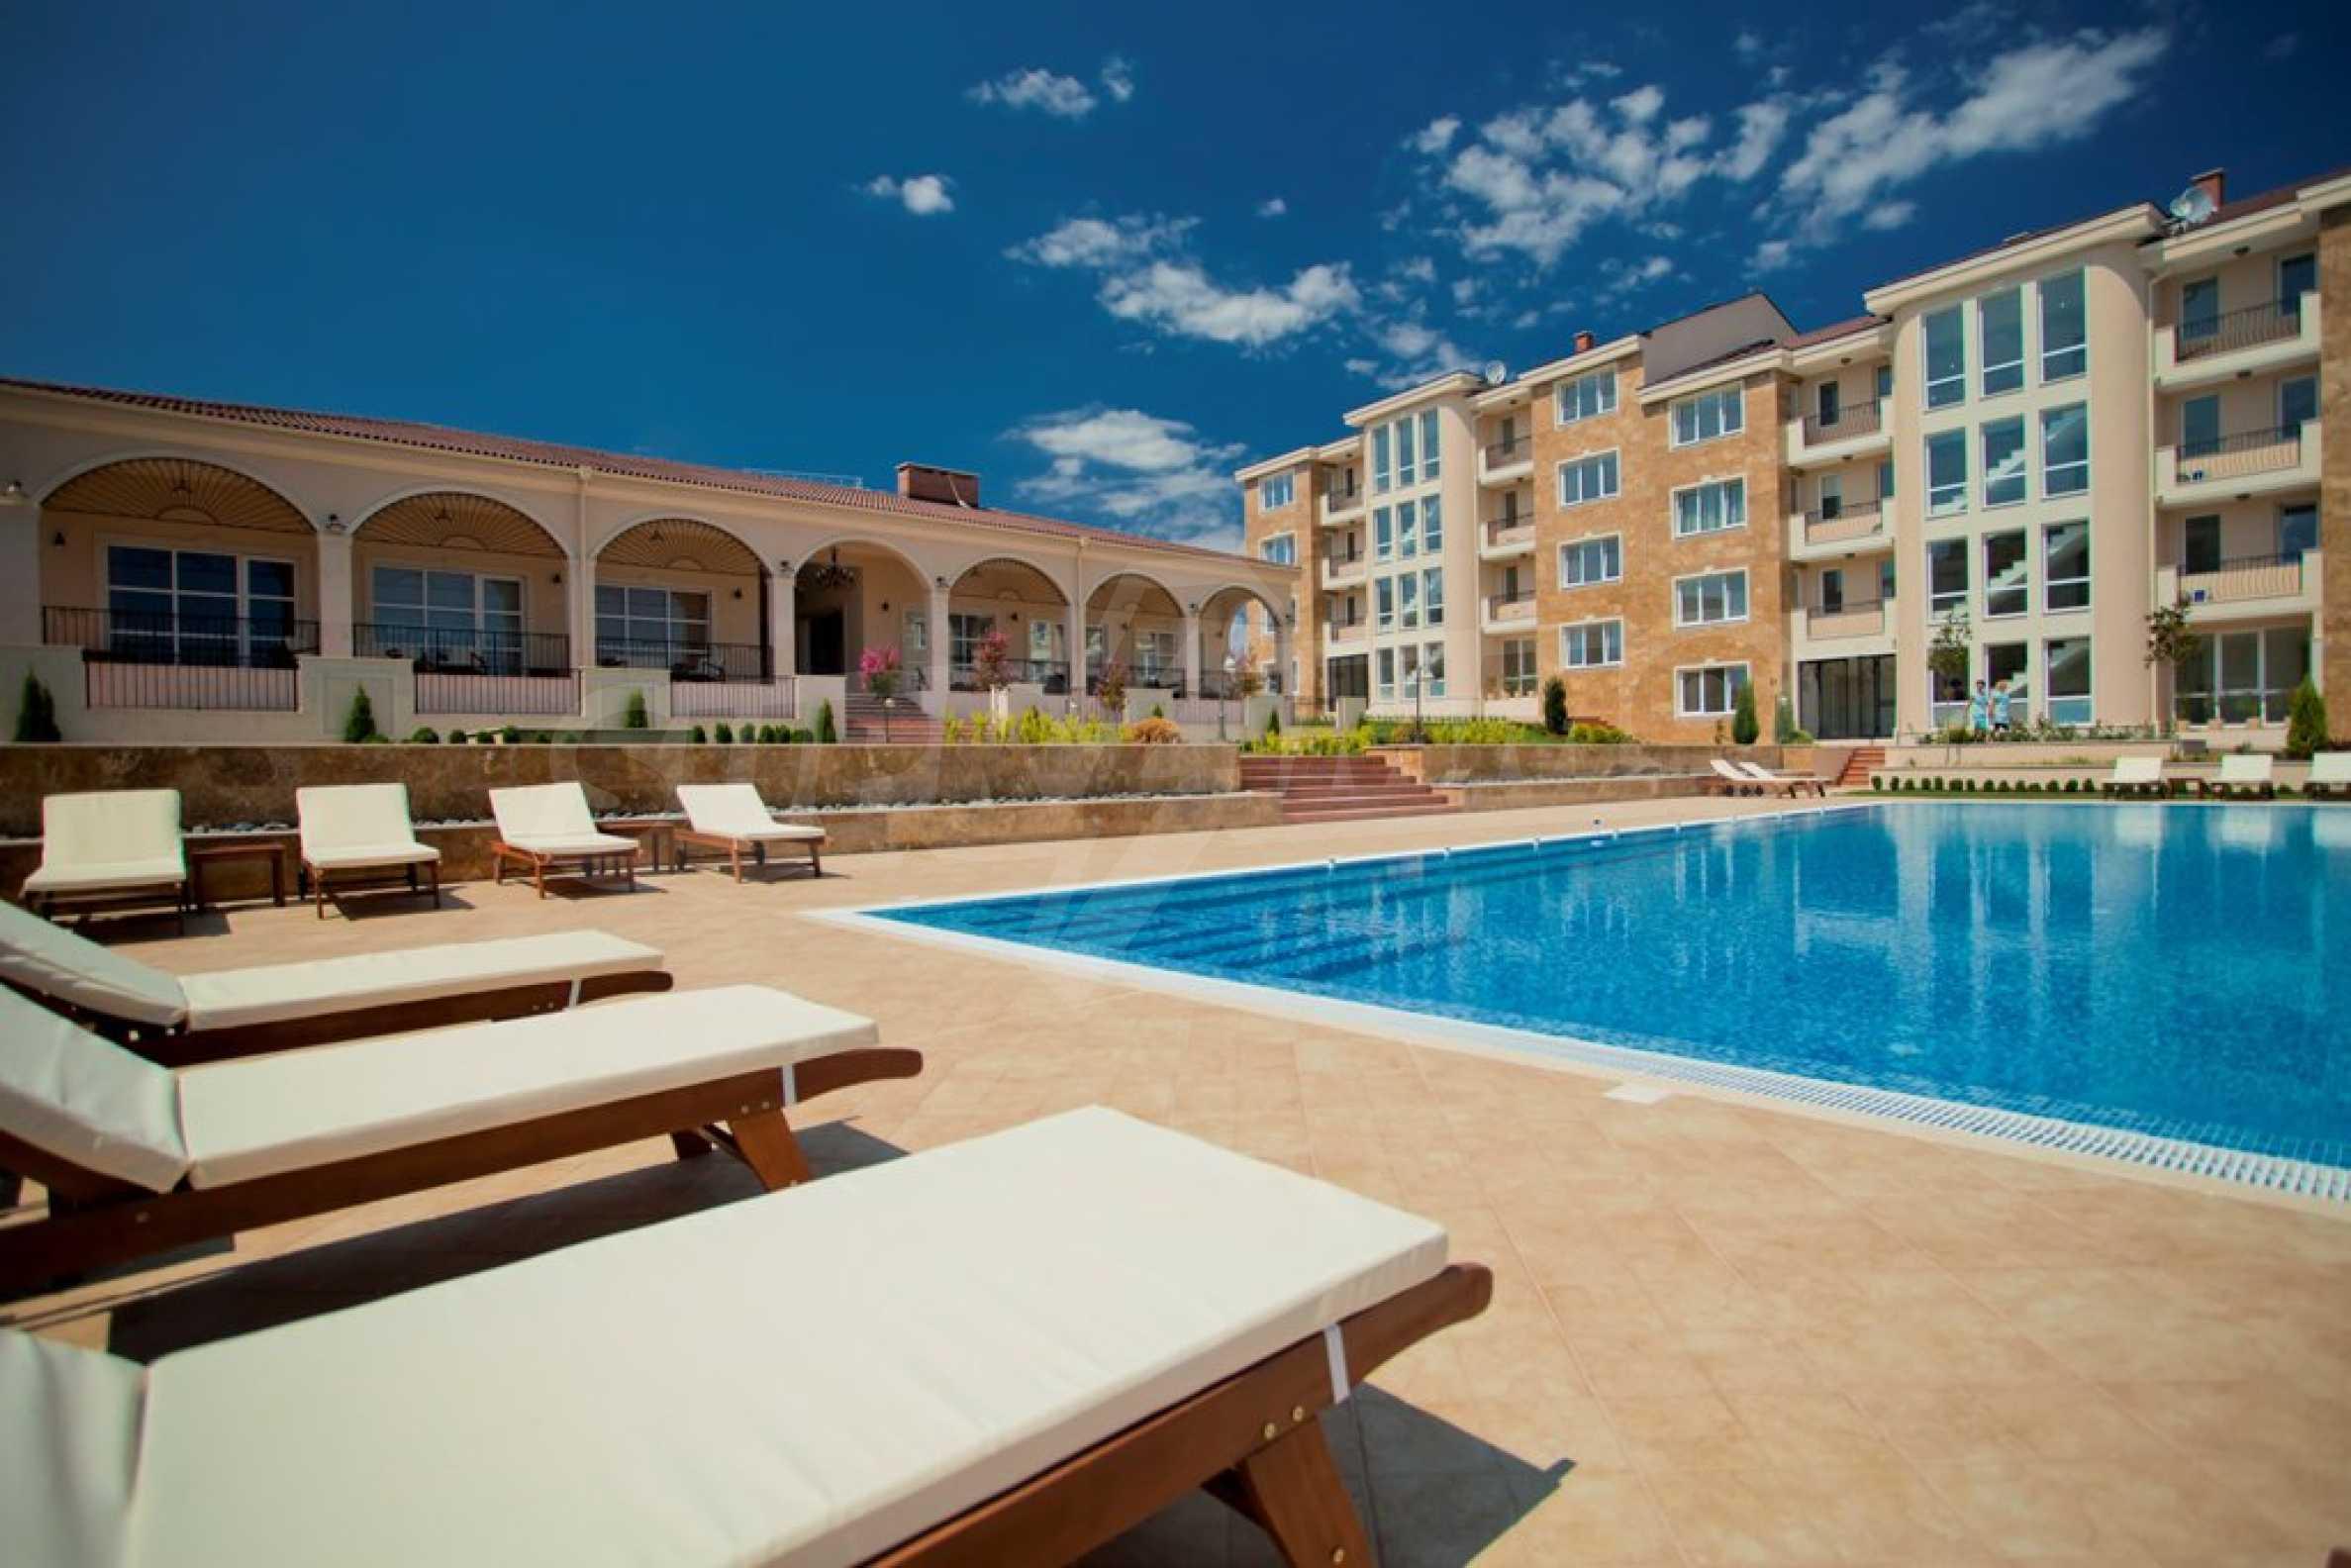 New apartment complex Atia resort in Chernomorets 8